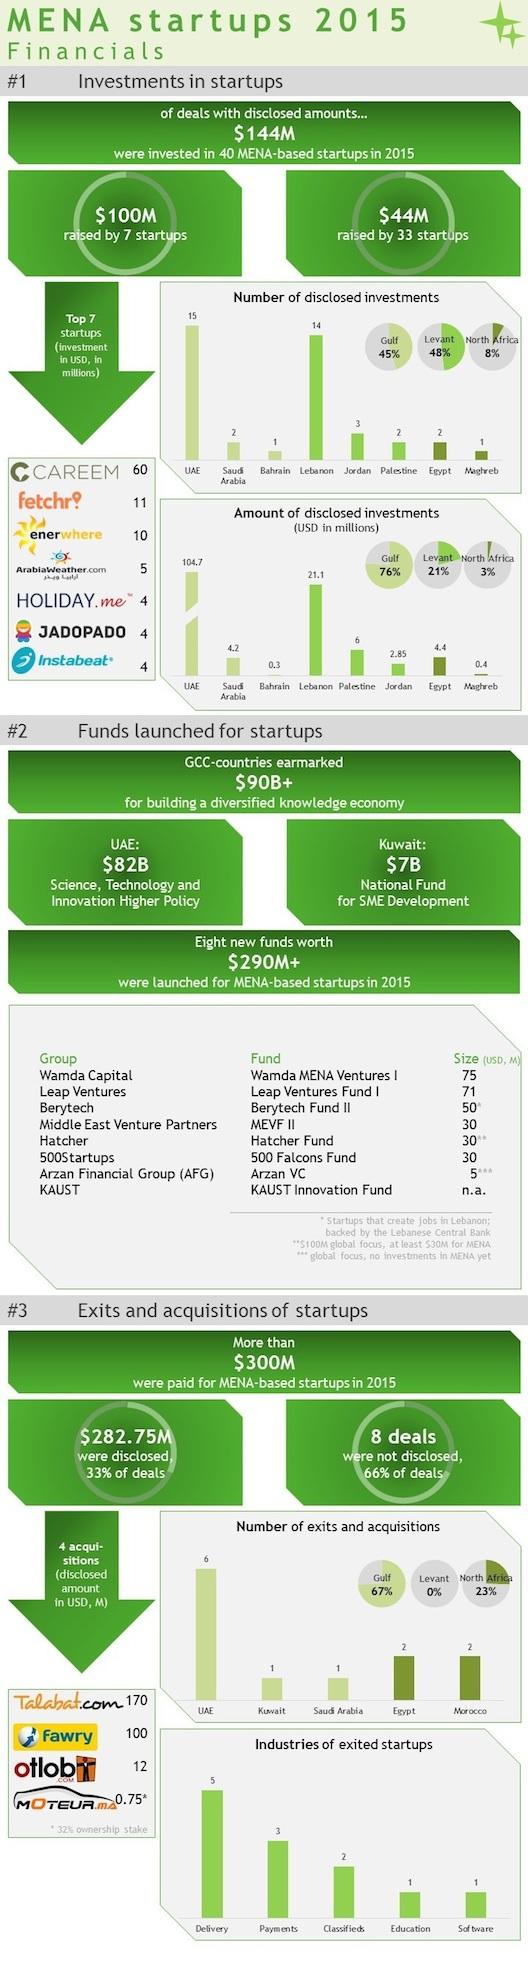 Financials for MENA startups 2015